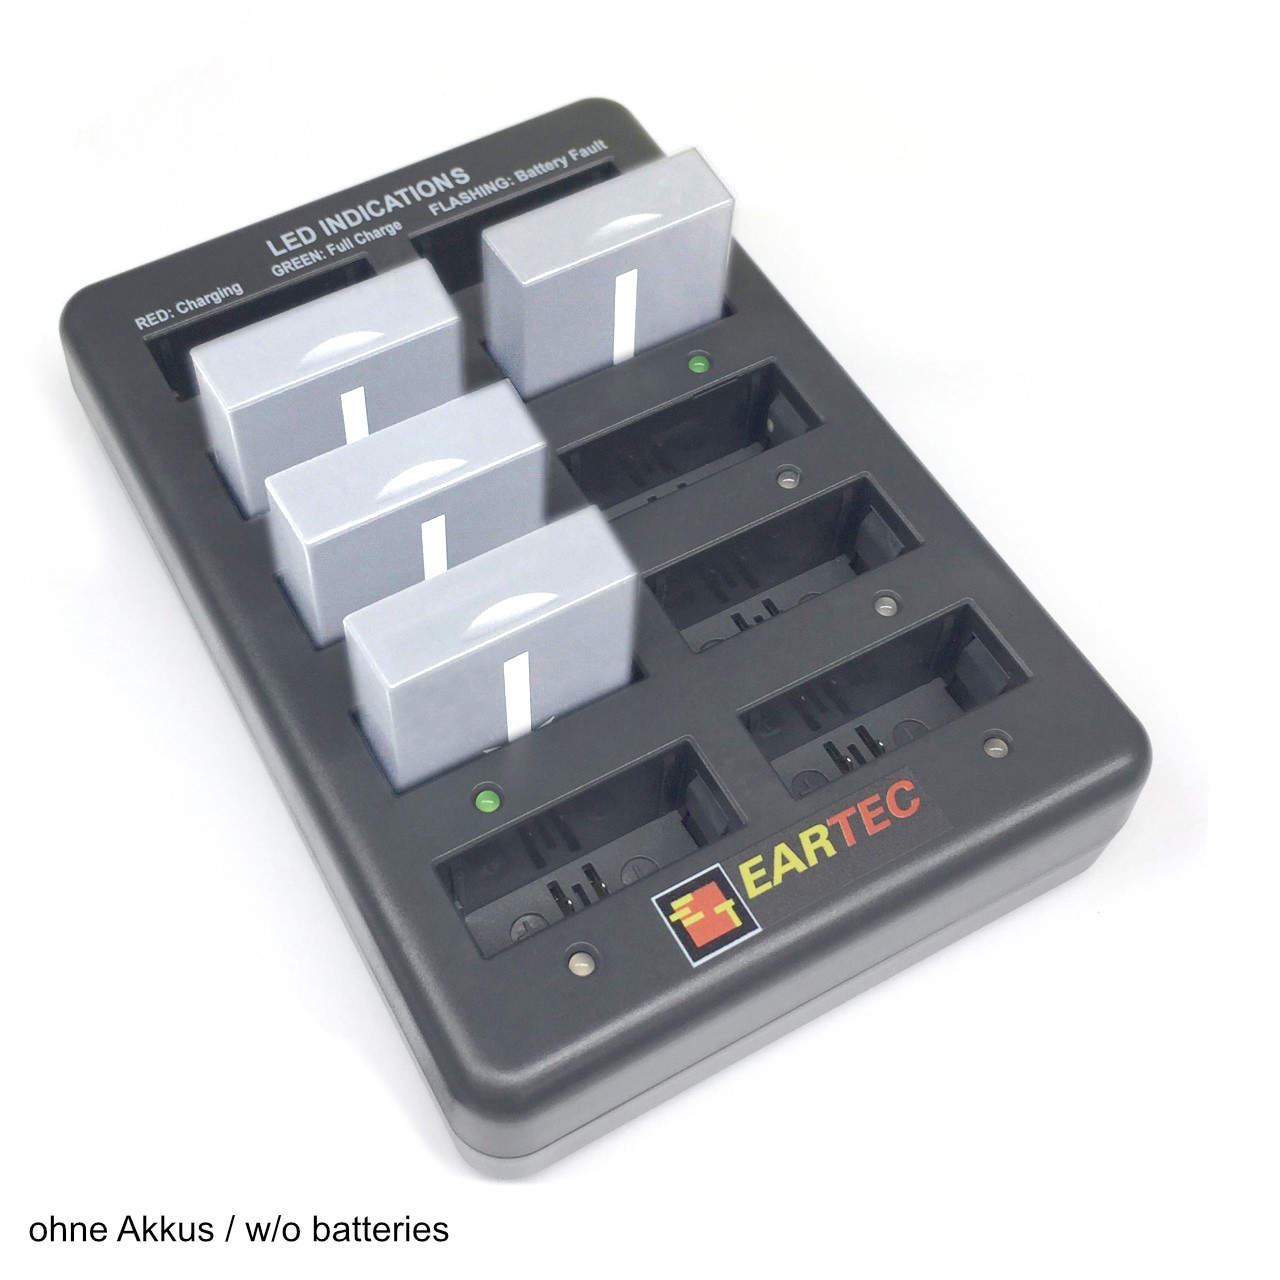 Artikelfoto 1 EARTEC Wireless Intercom UltraLITE 10-fach Akku Ladegerät CHLX10E